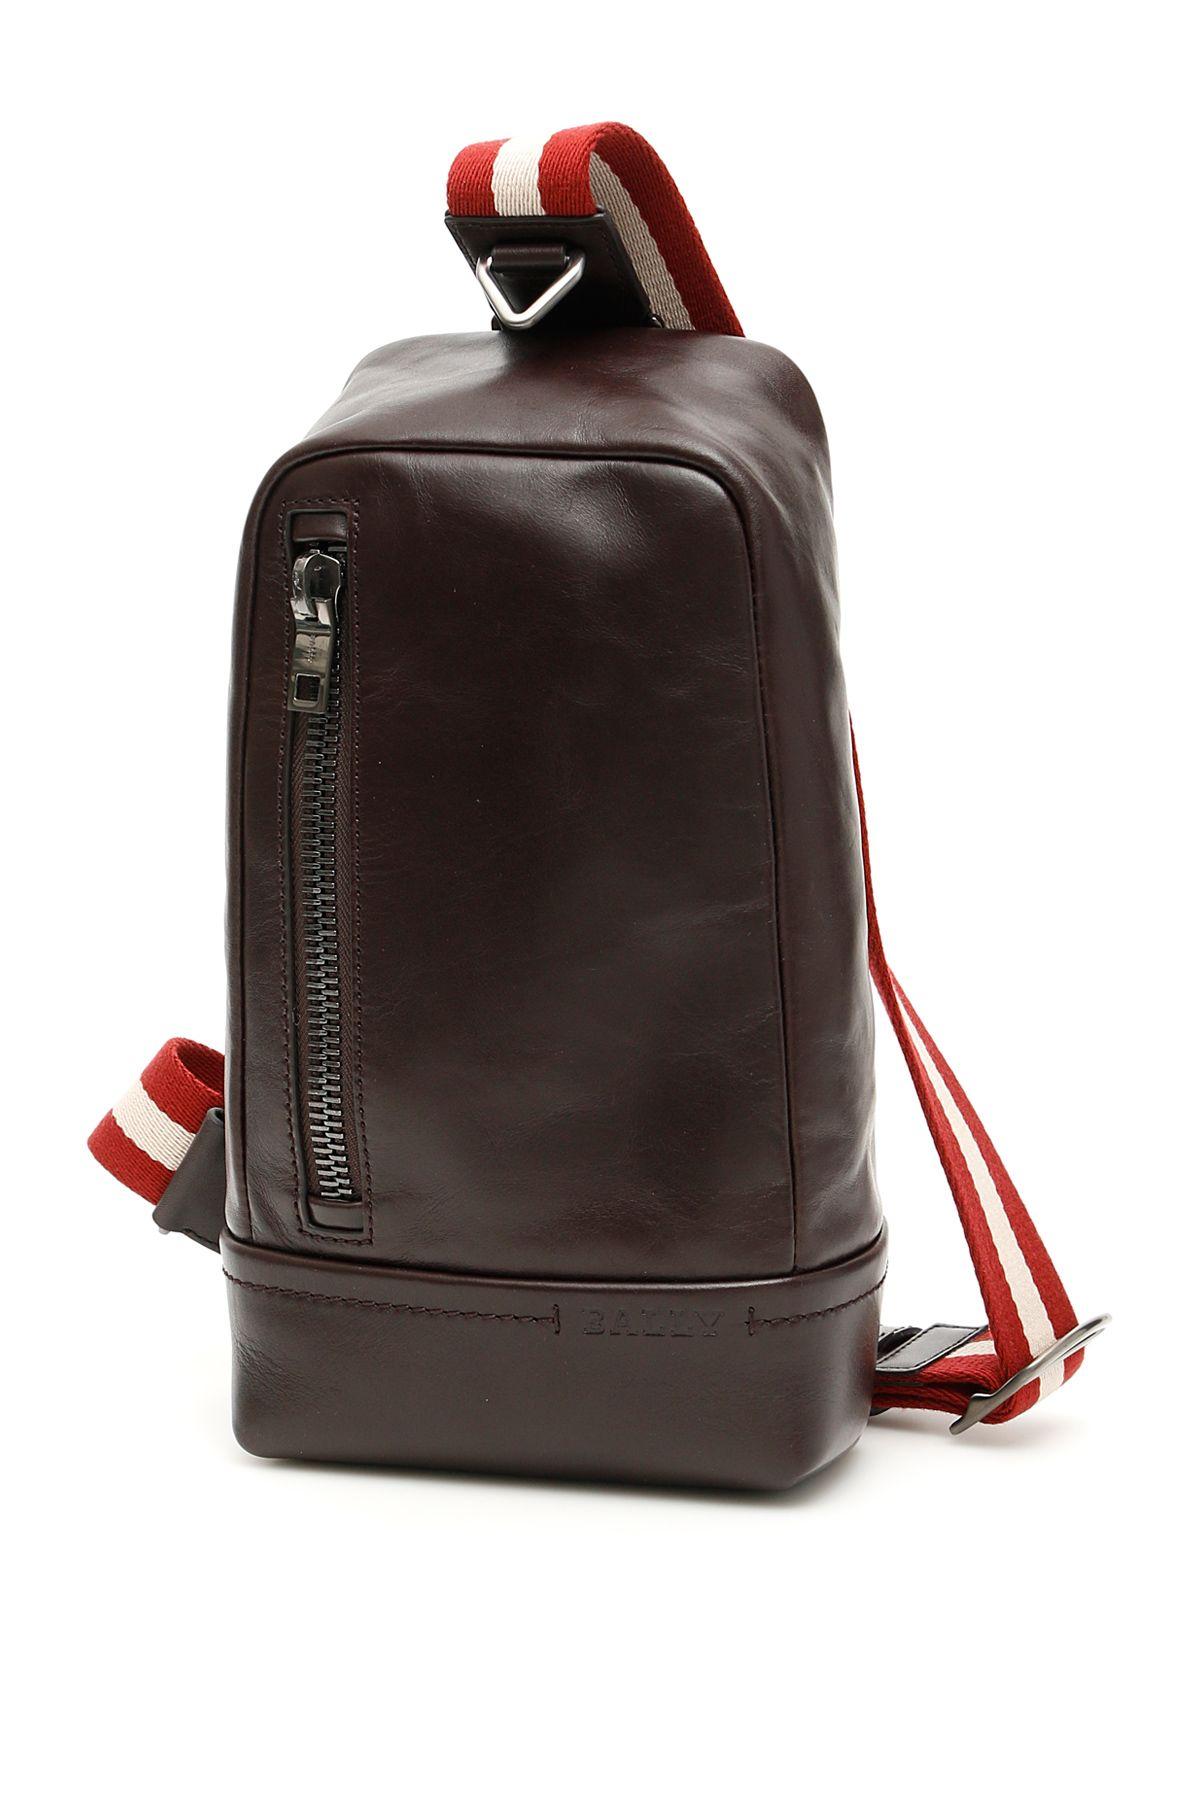 Bally Tanis Crossbody Bag